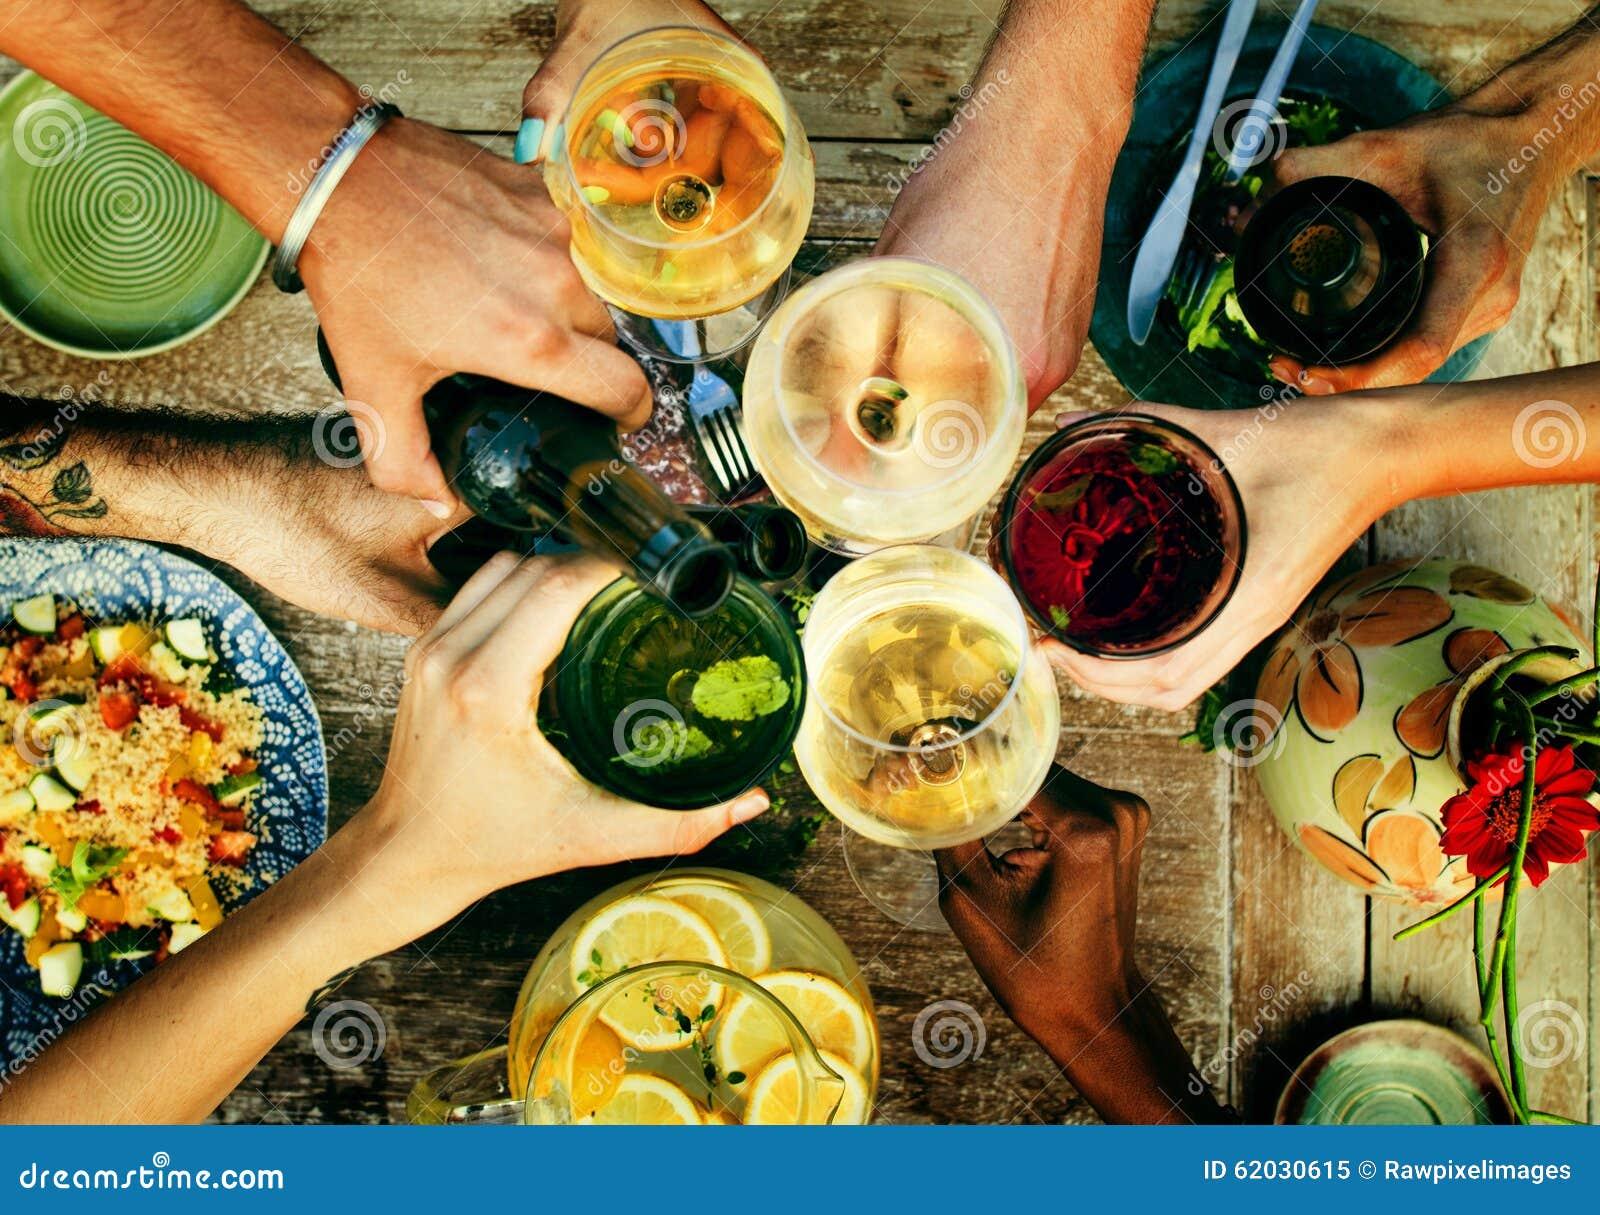 drink beverage meal concept bebida comida bevanda della dinner partido concepto concetto pasto partito alimento dell